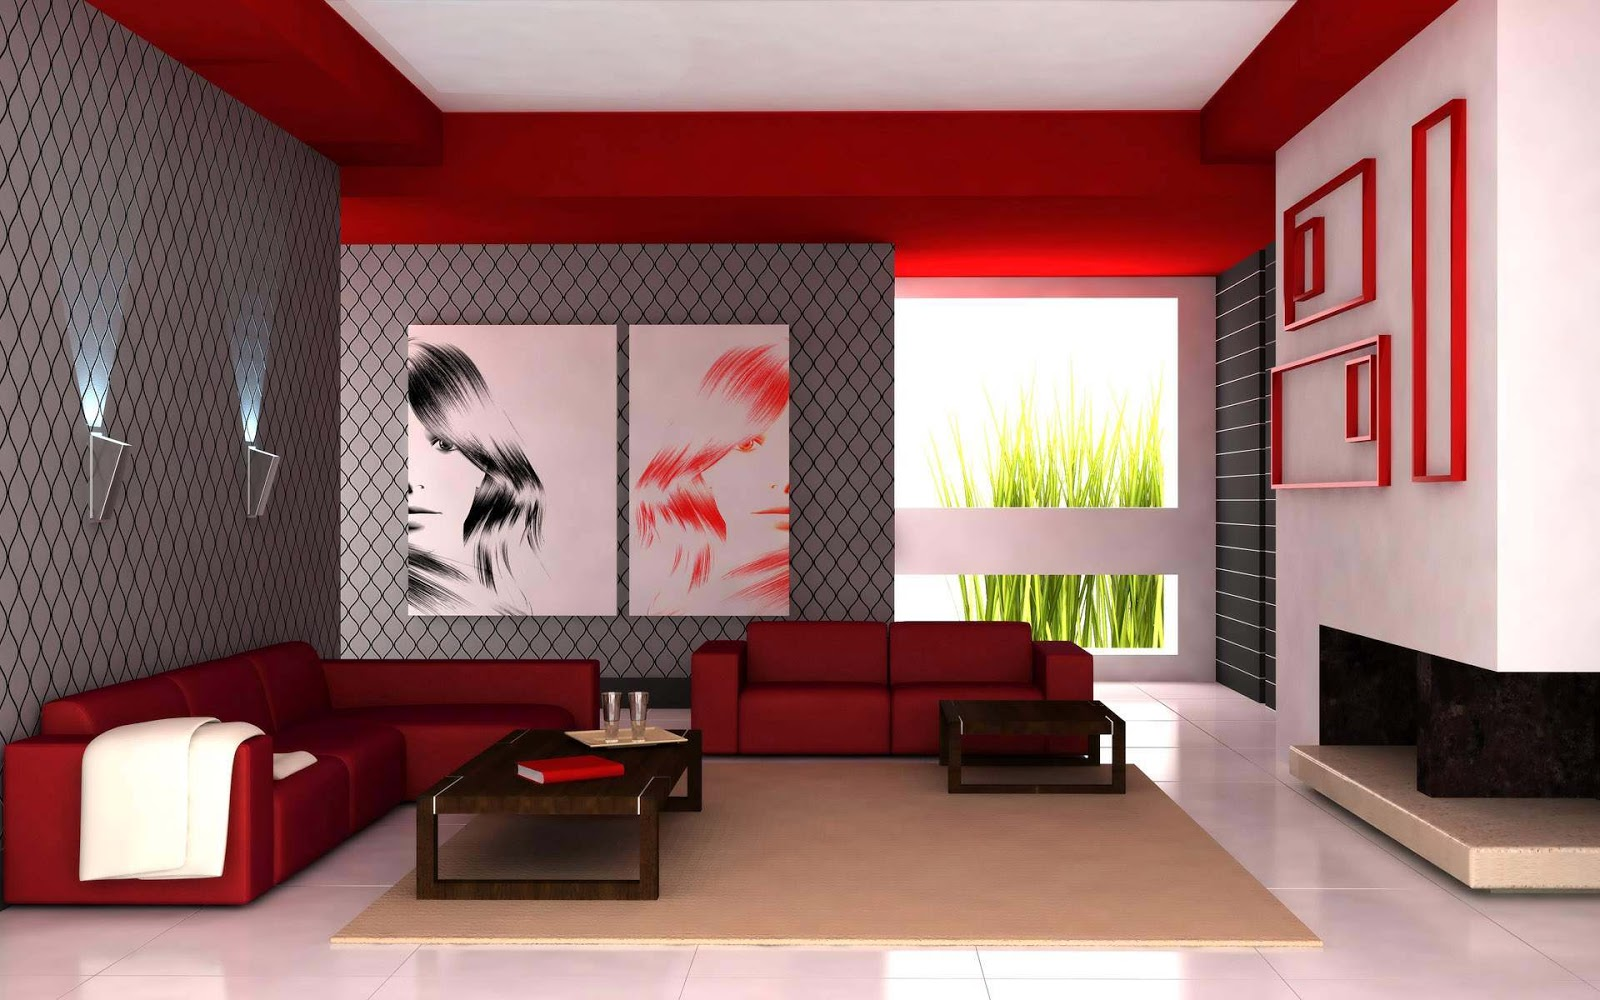 Modern Living Room Design Ideas 2014 title=